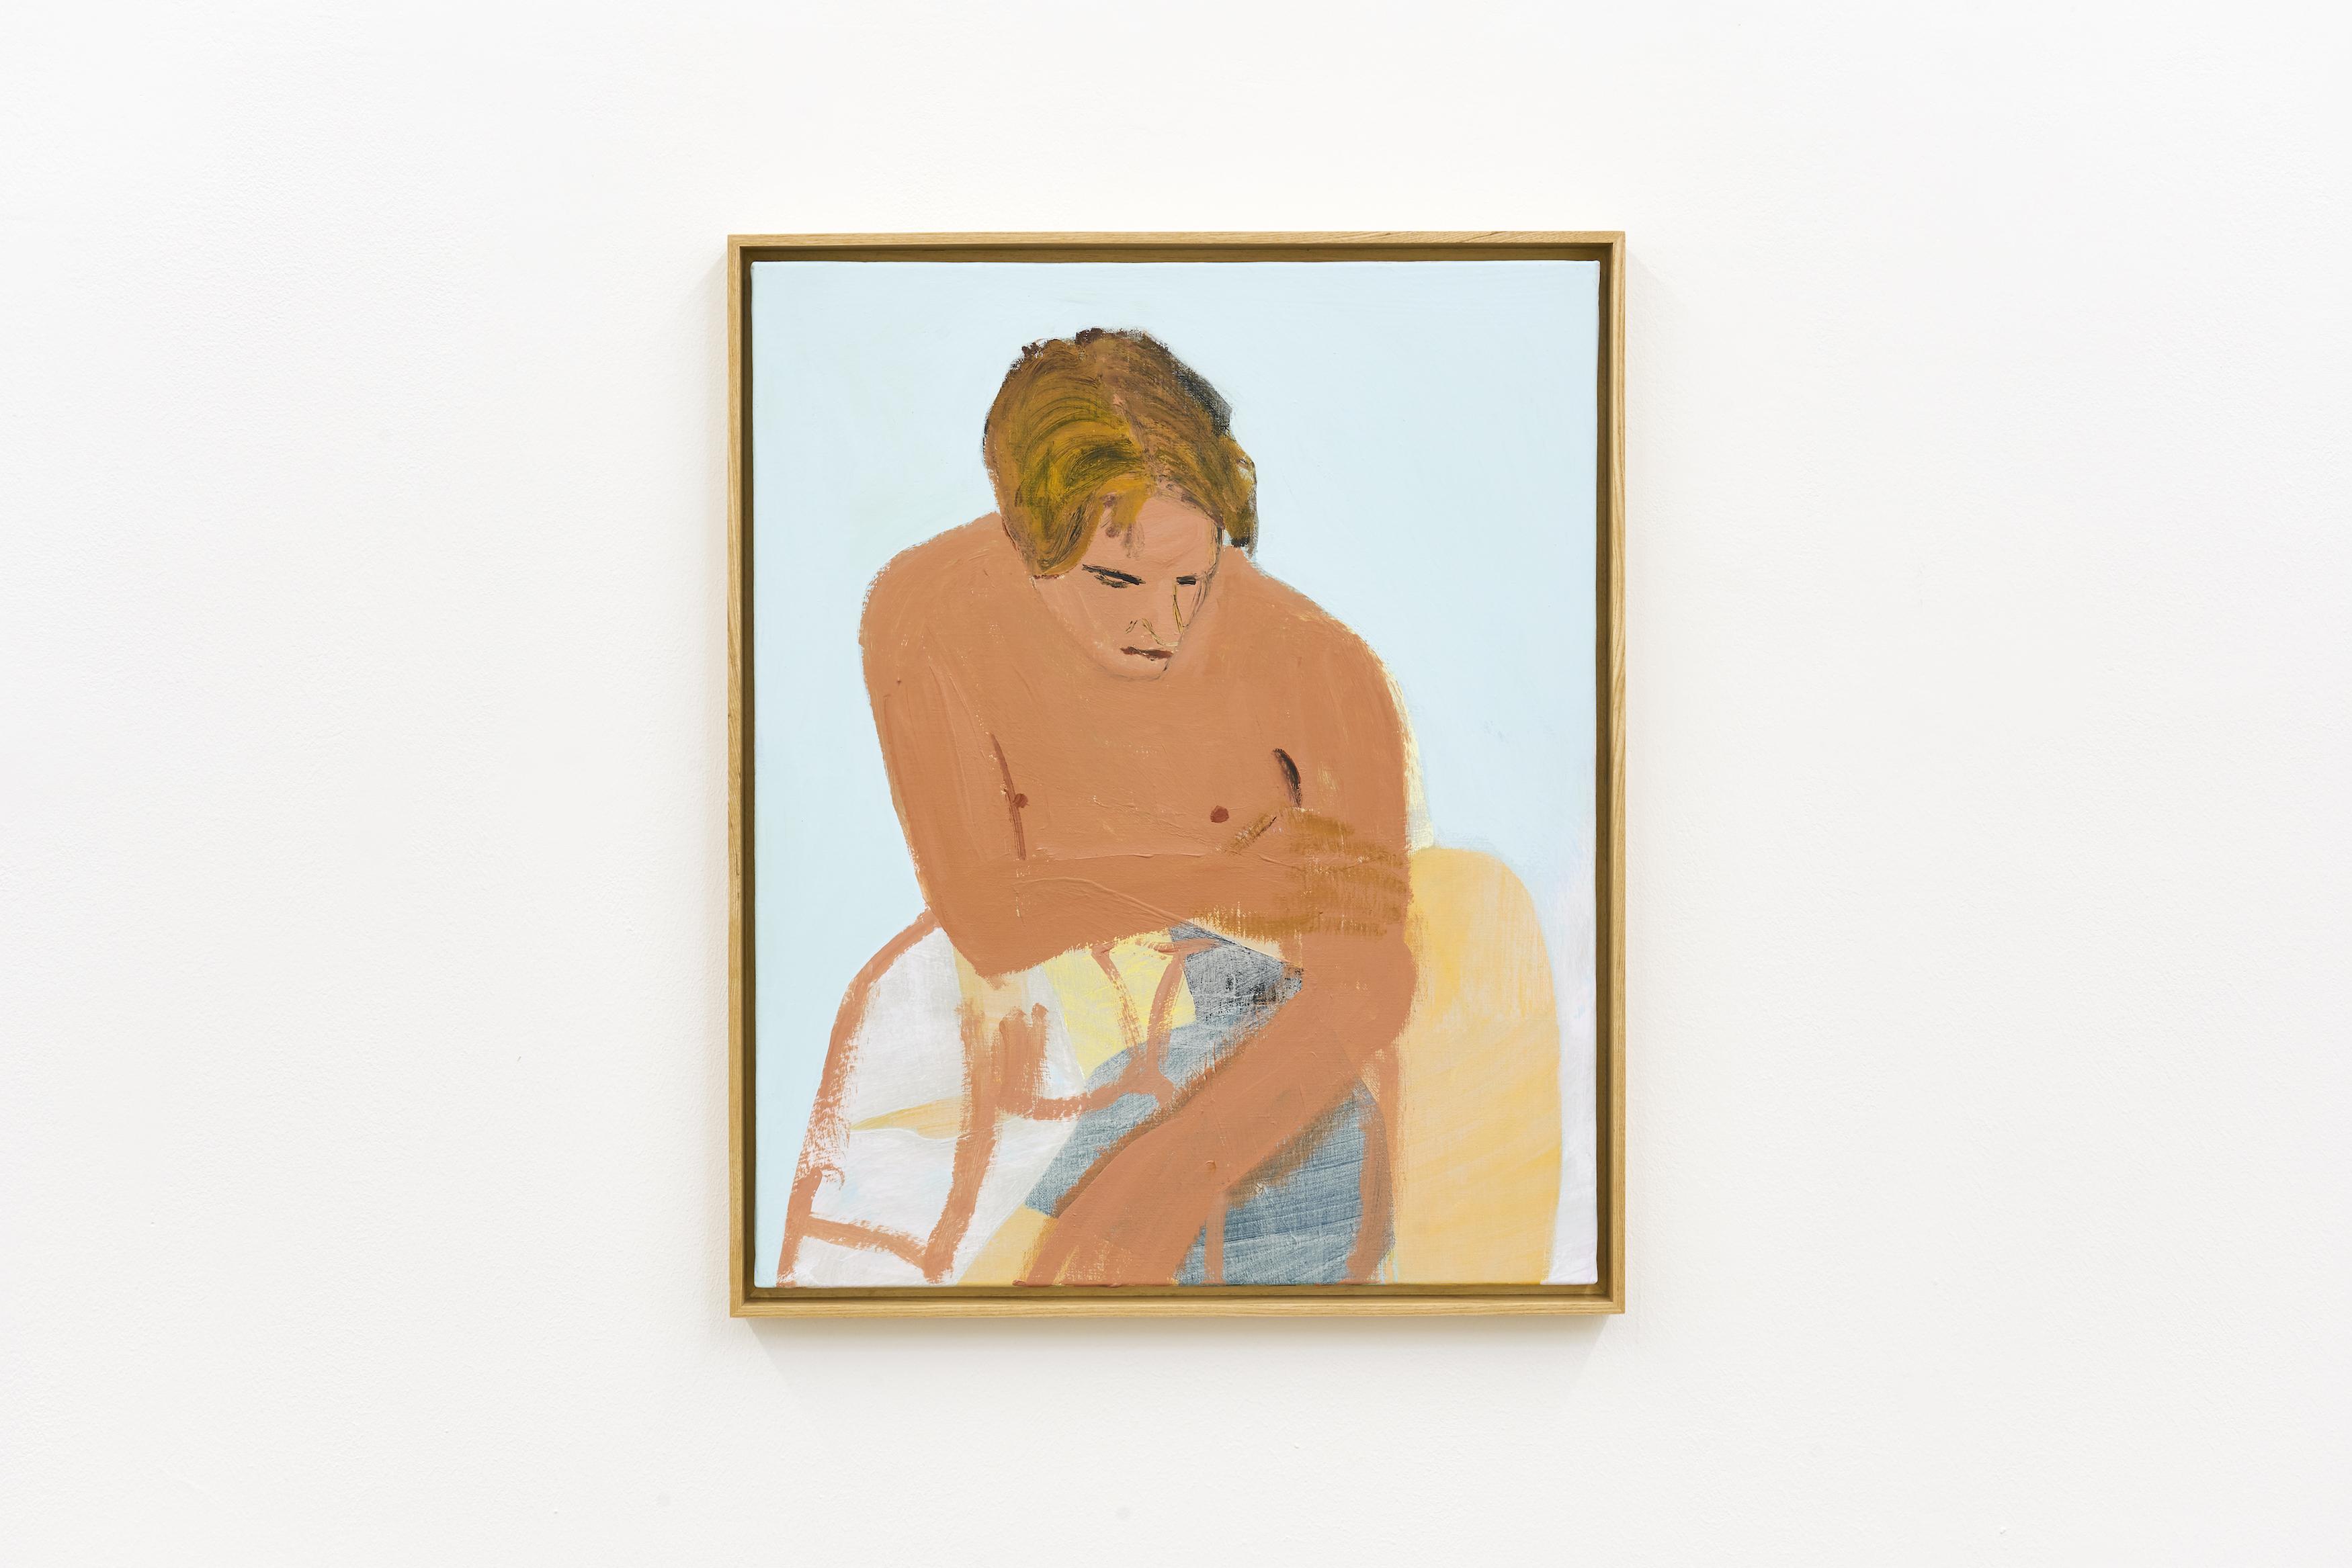 Gregory Olympio, Homme assis, fond bleu, 2020, Acrylic on canvas, 61 x 50 cm.